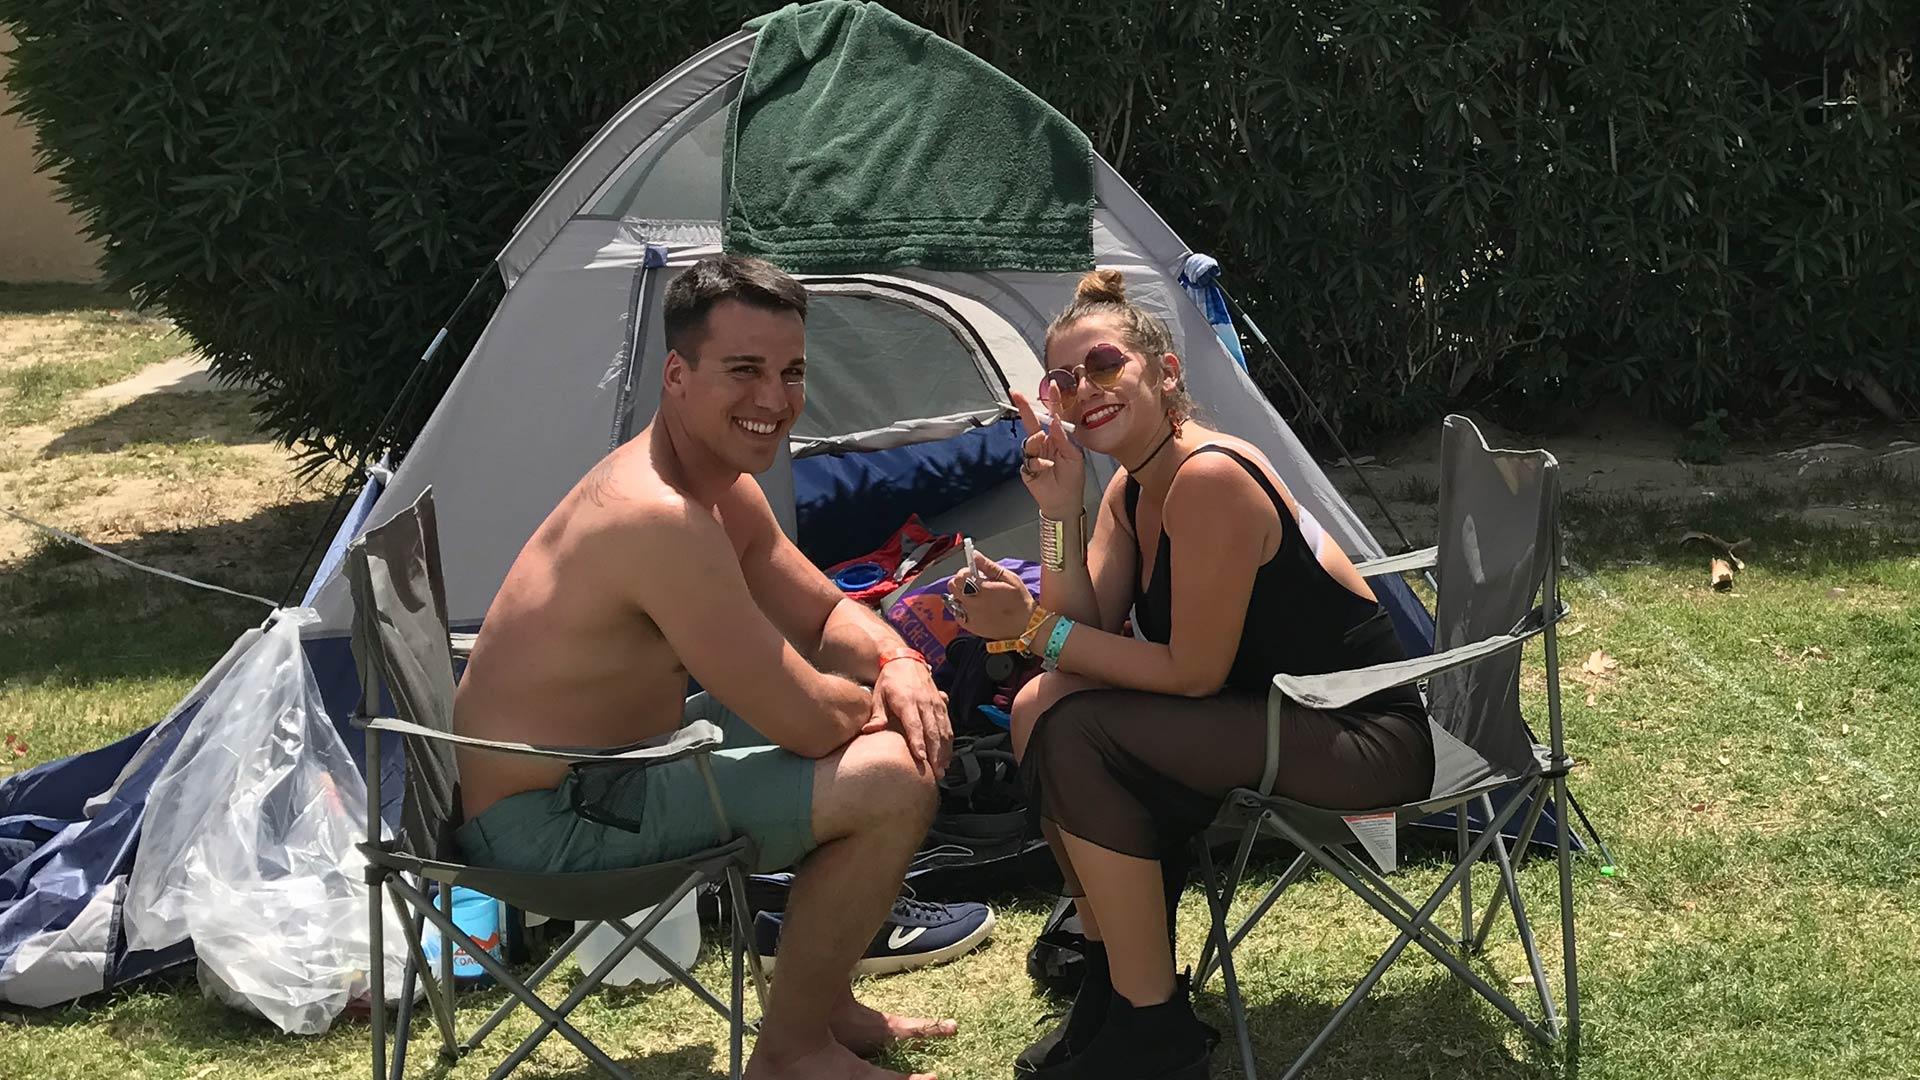 coachella campgrounds